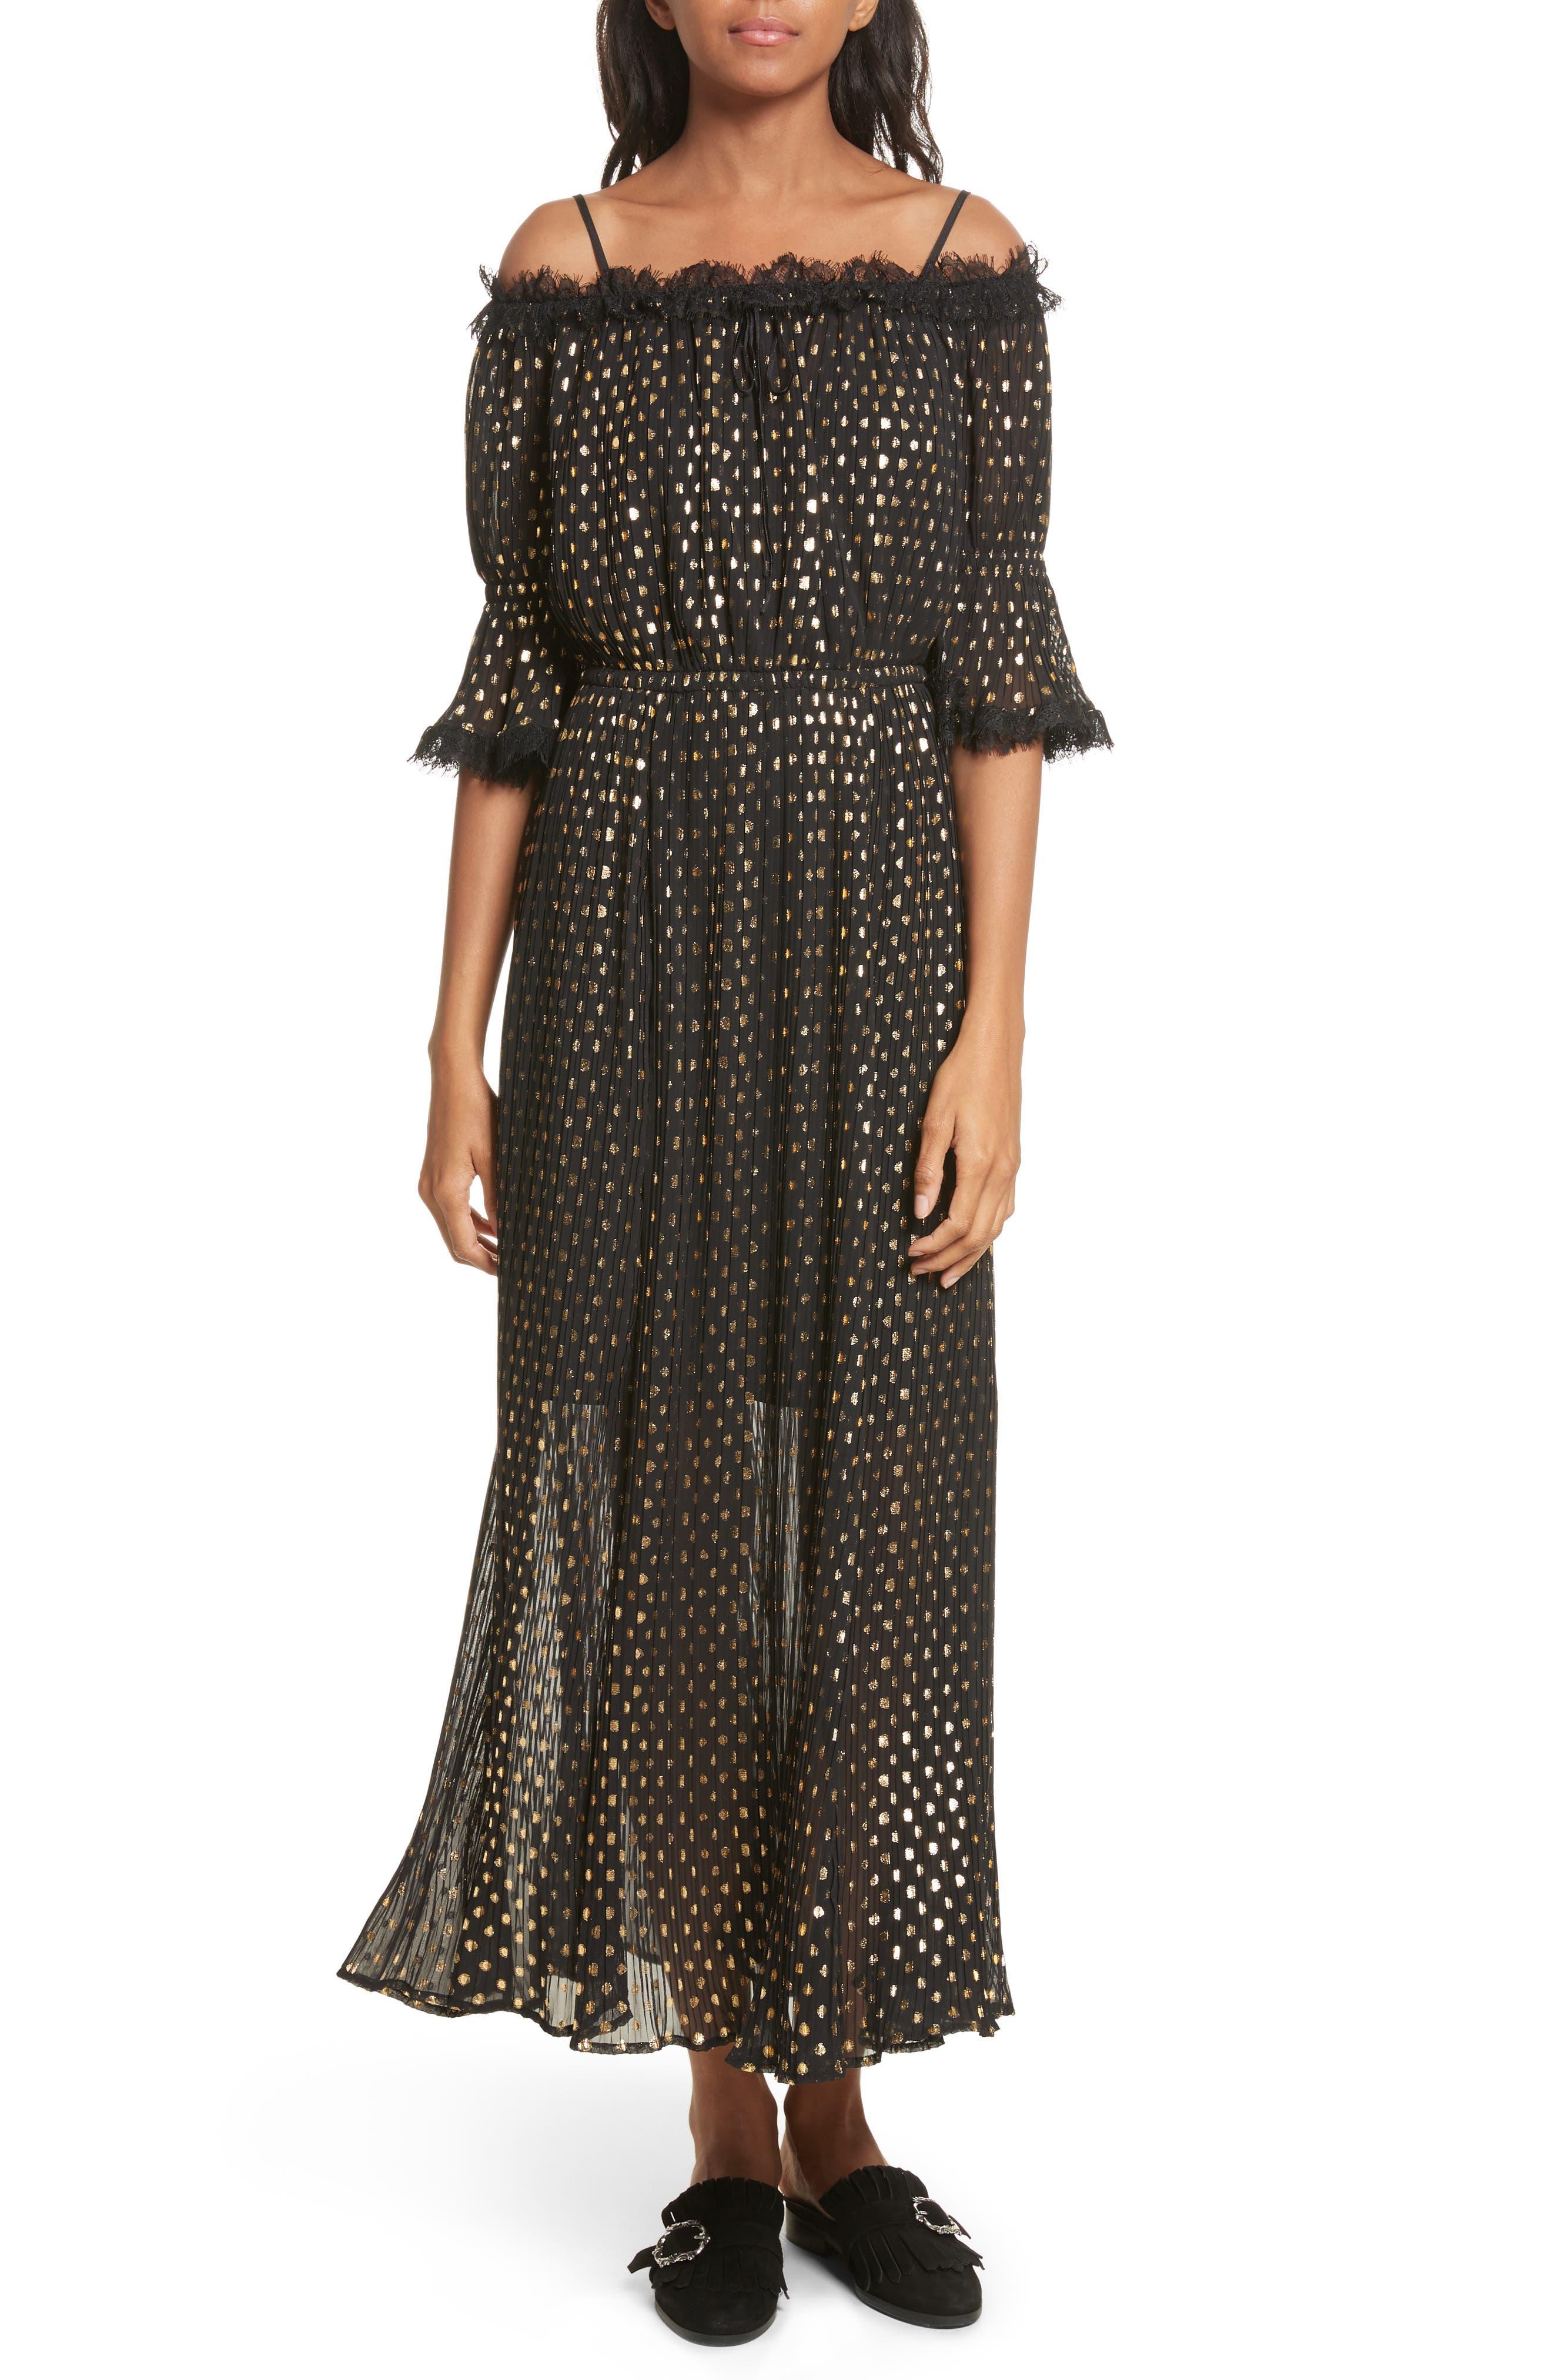 Main Image - The Kooples Polka Dot Off the Shoulder Maxi Dress